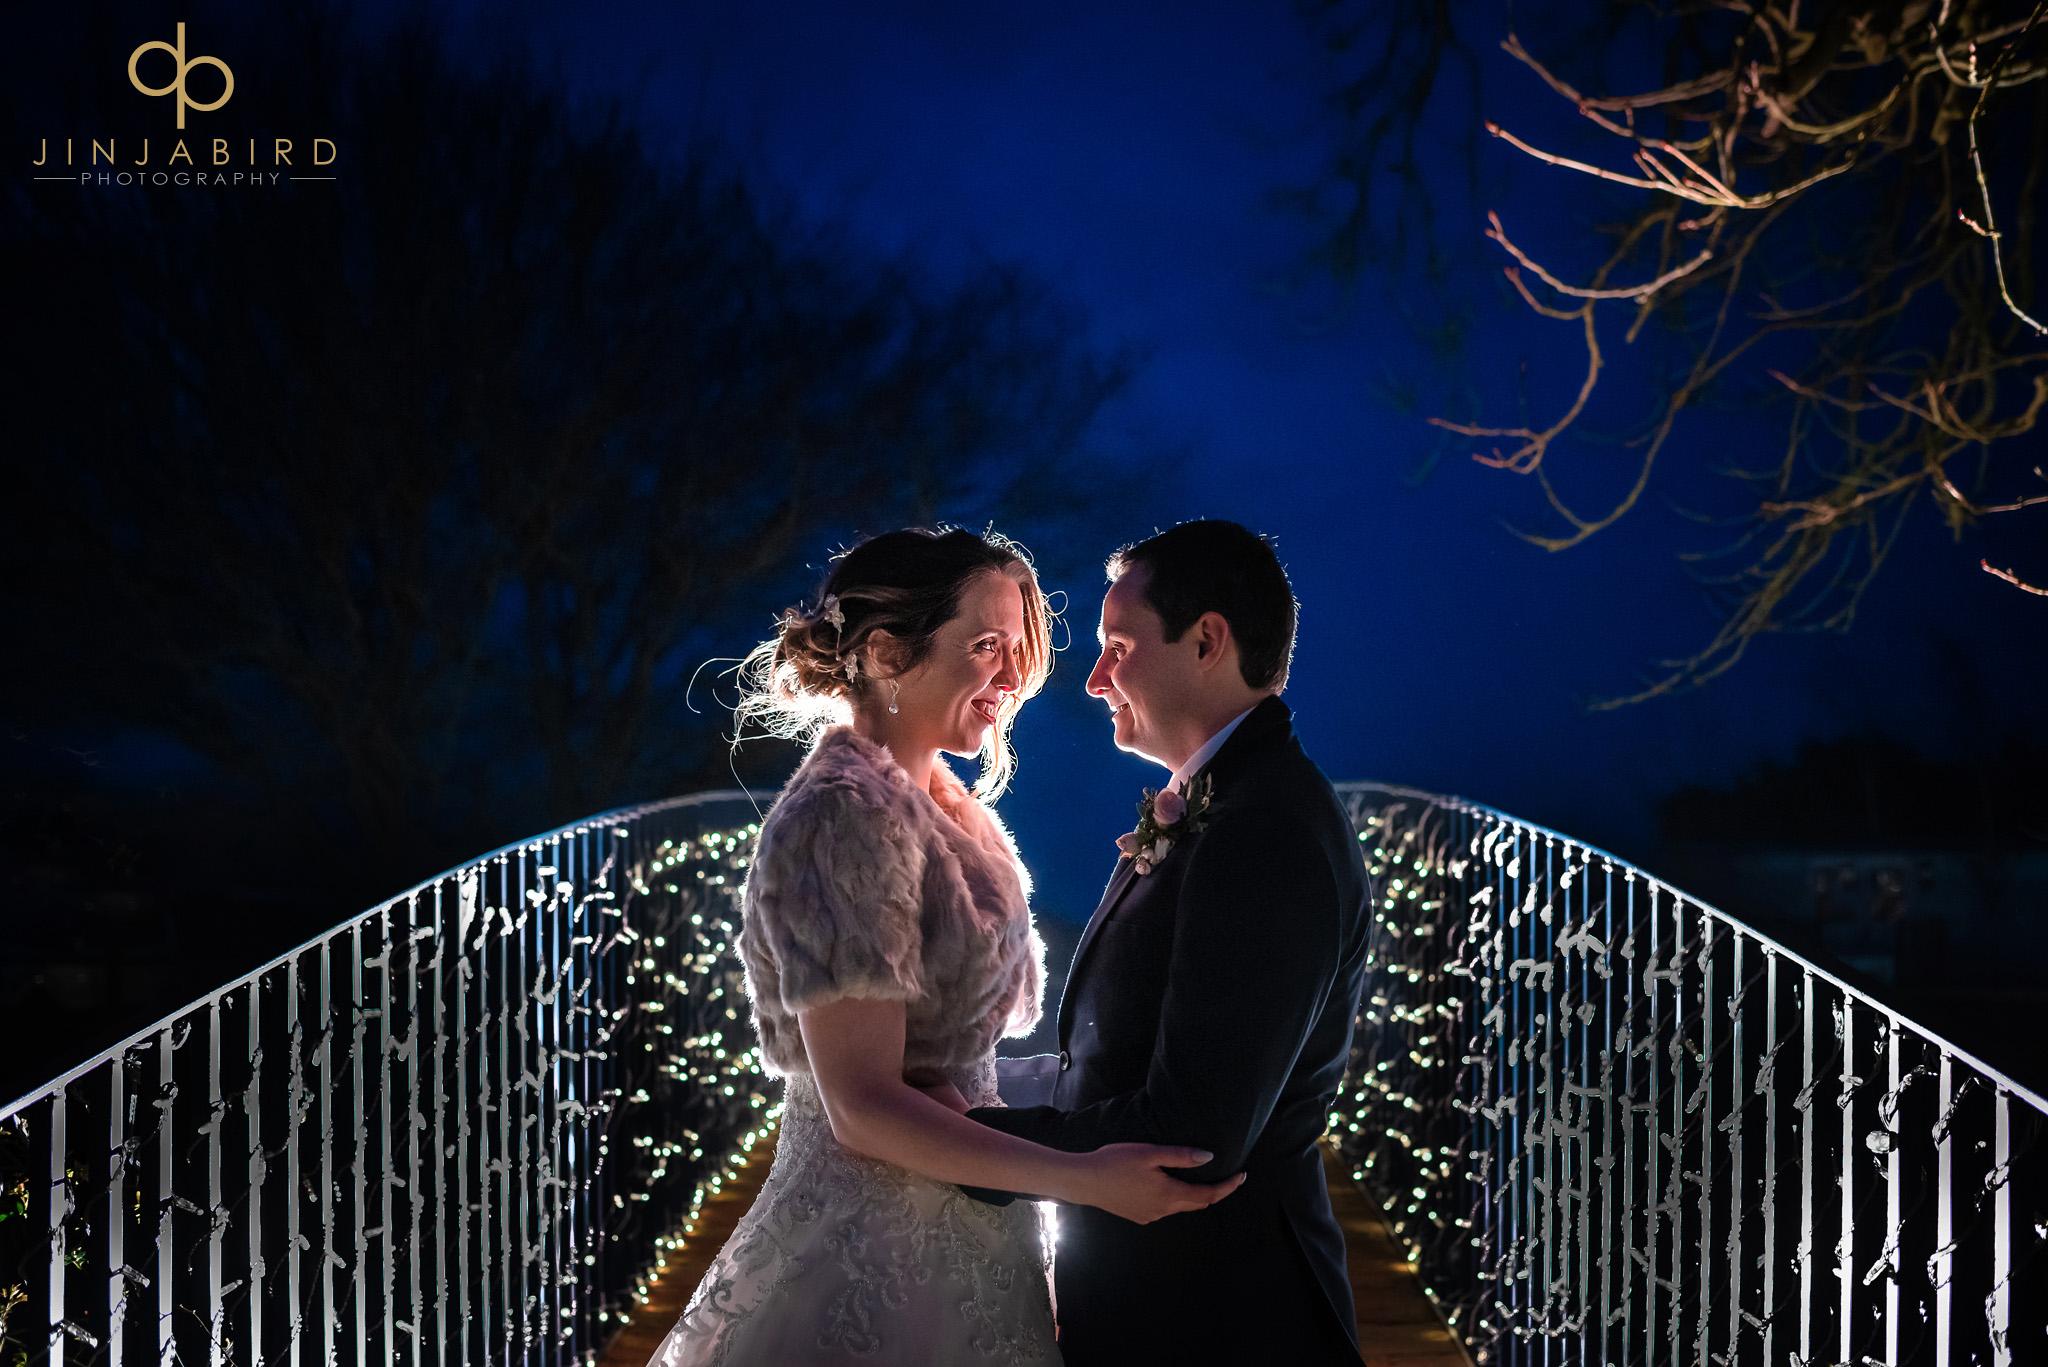 bride with groom on bridge at night bassmead manor